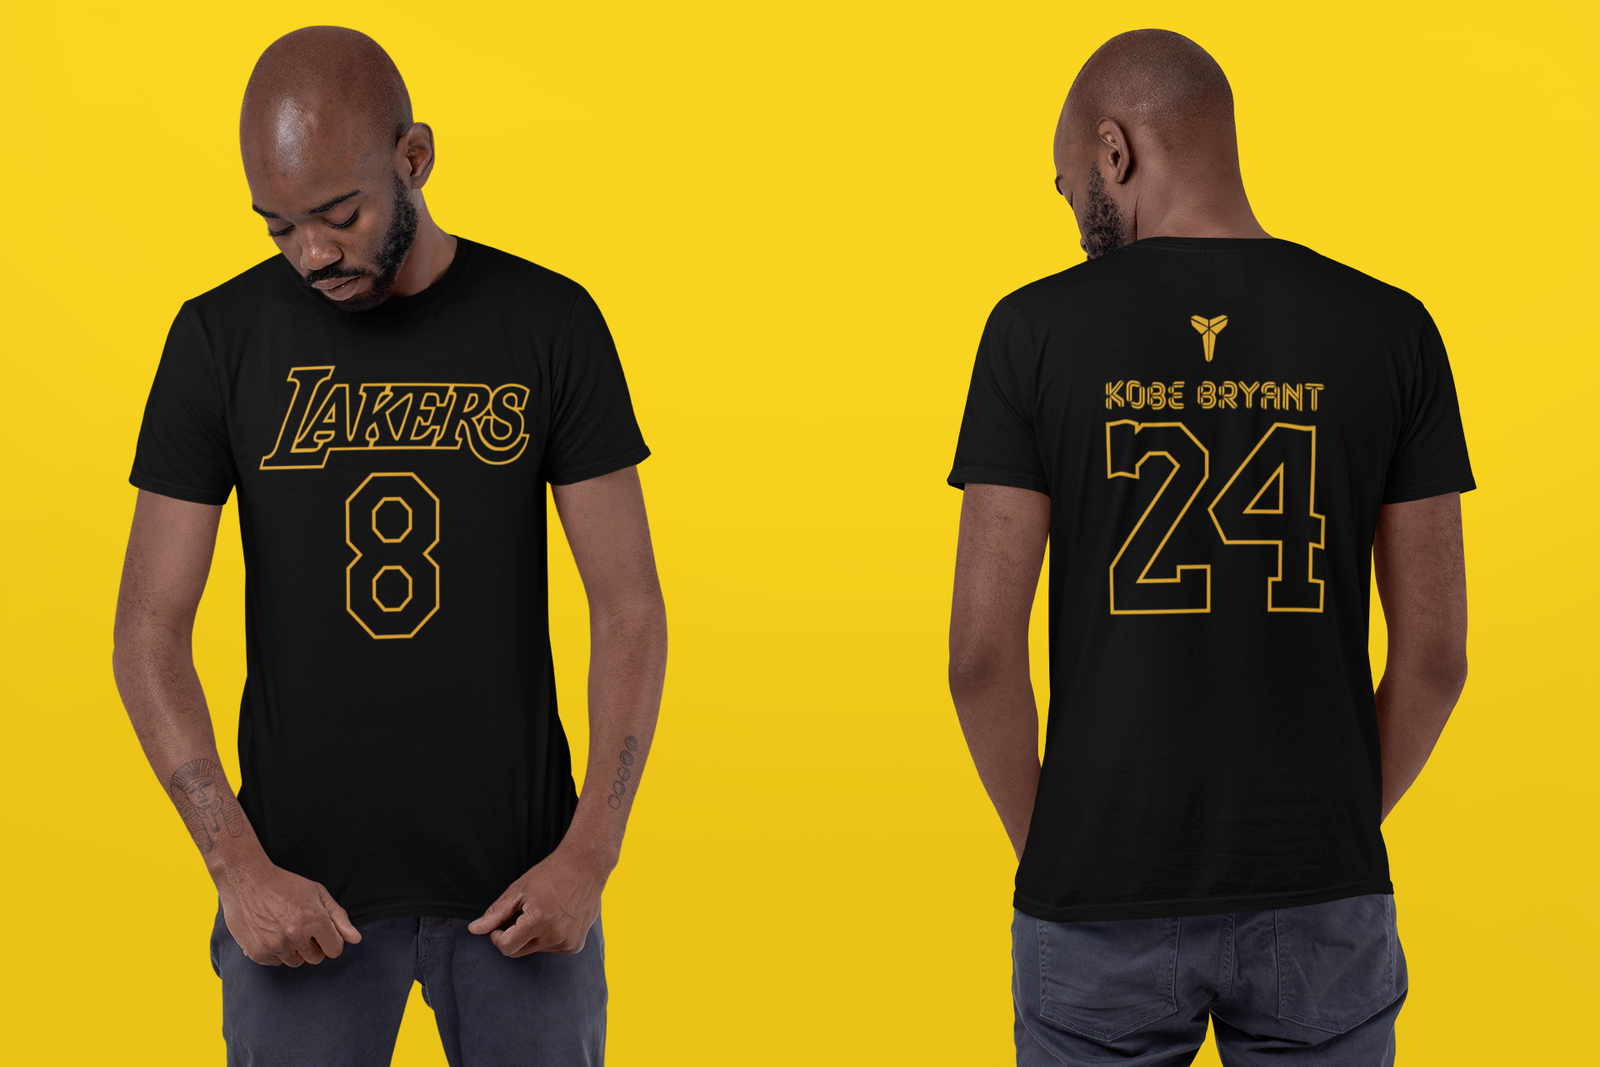 Nike Kobe Black Mamba 24 806759 010